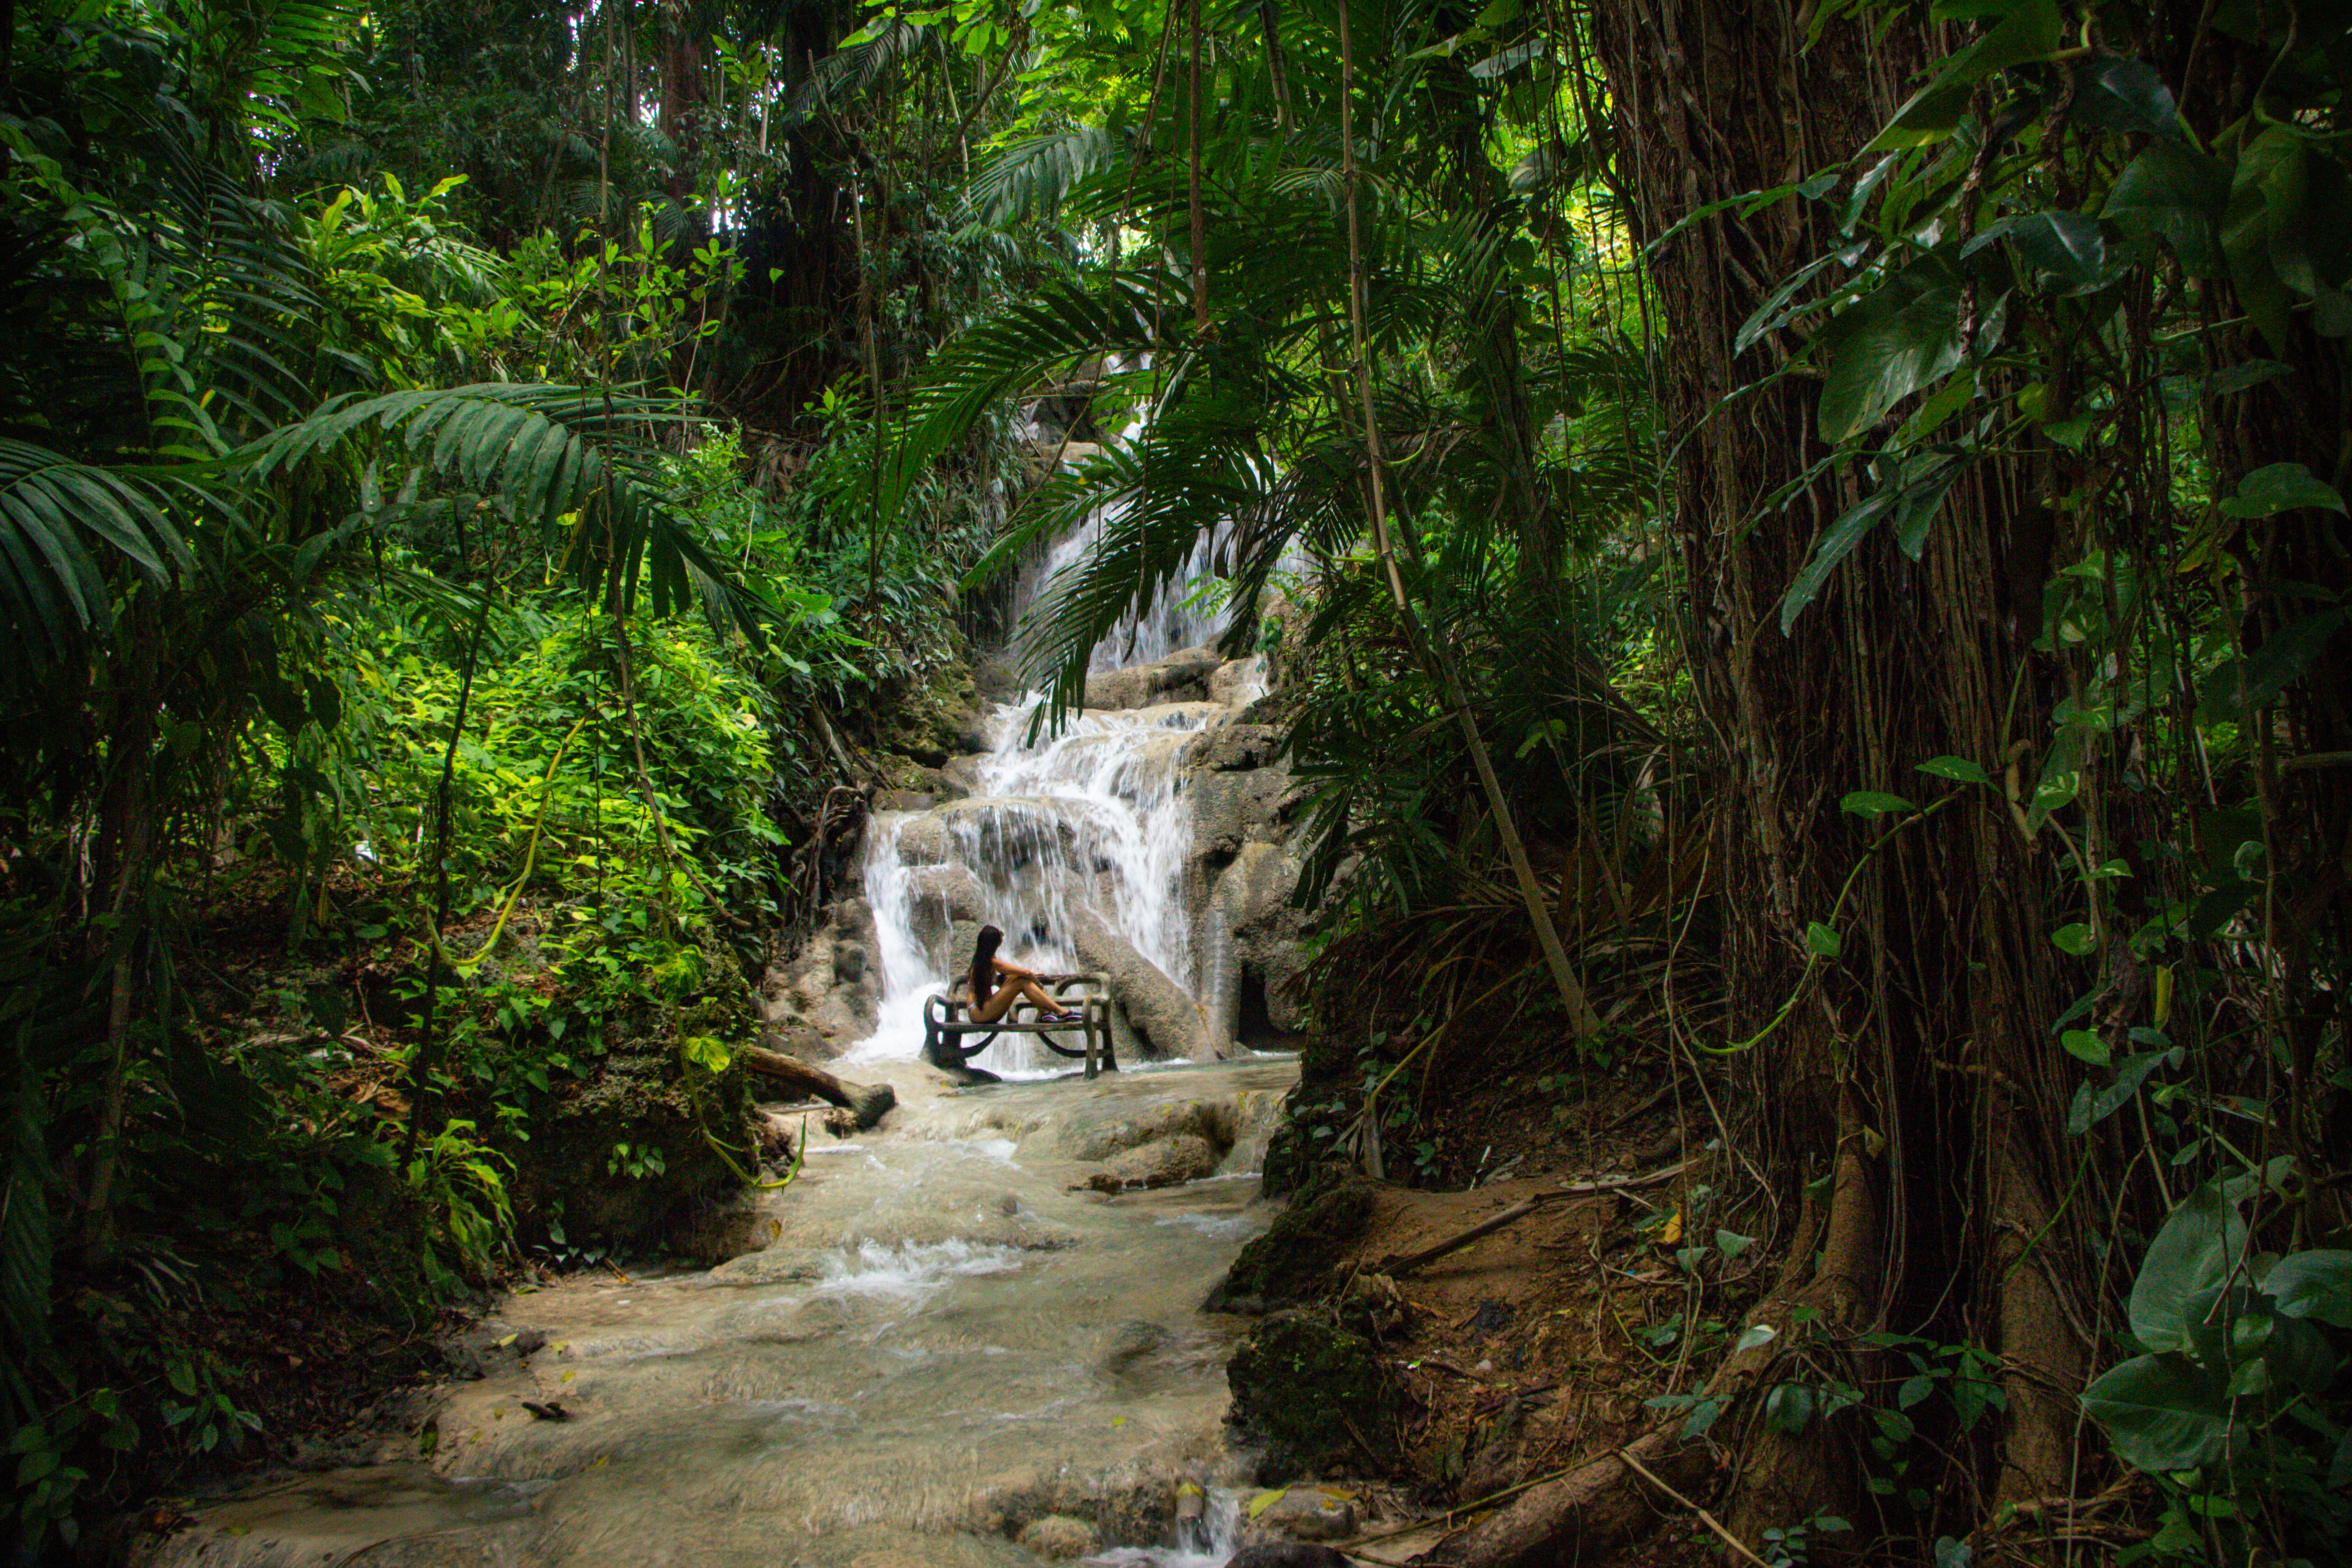 The Turtle River Falls & Garden